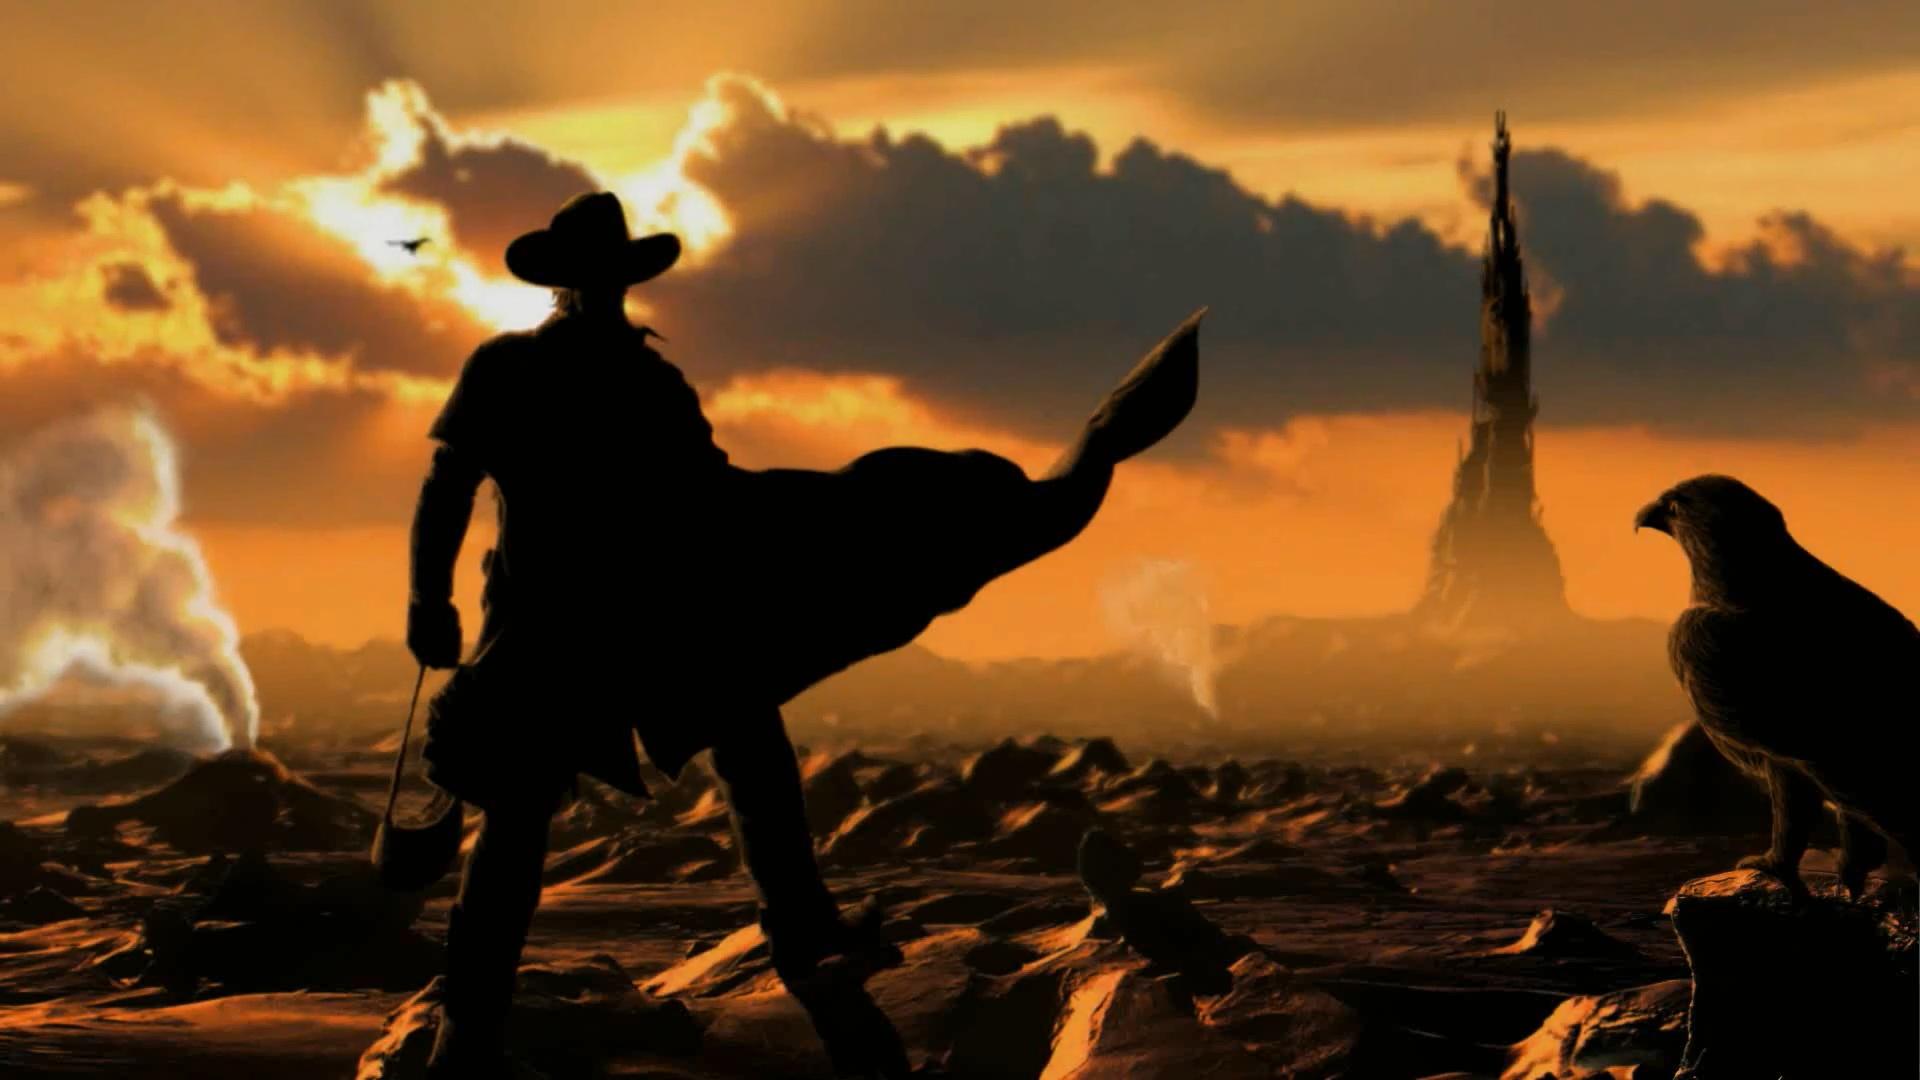 western cowboy wallpaper wallpapersafari